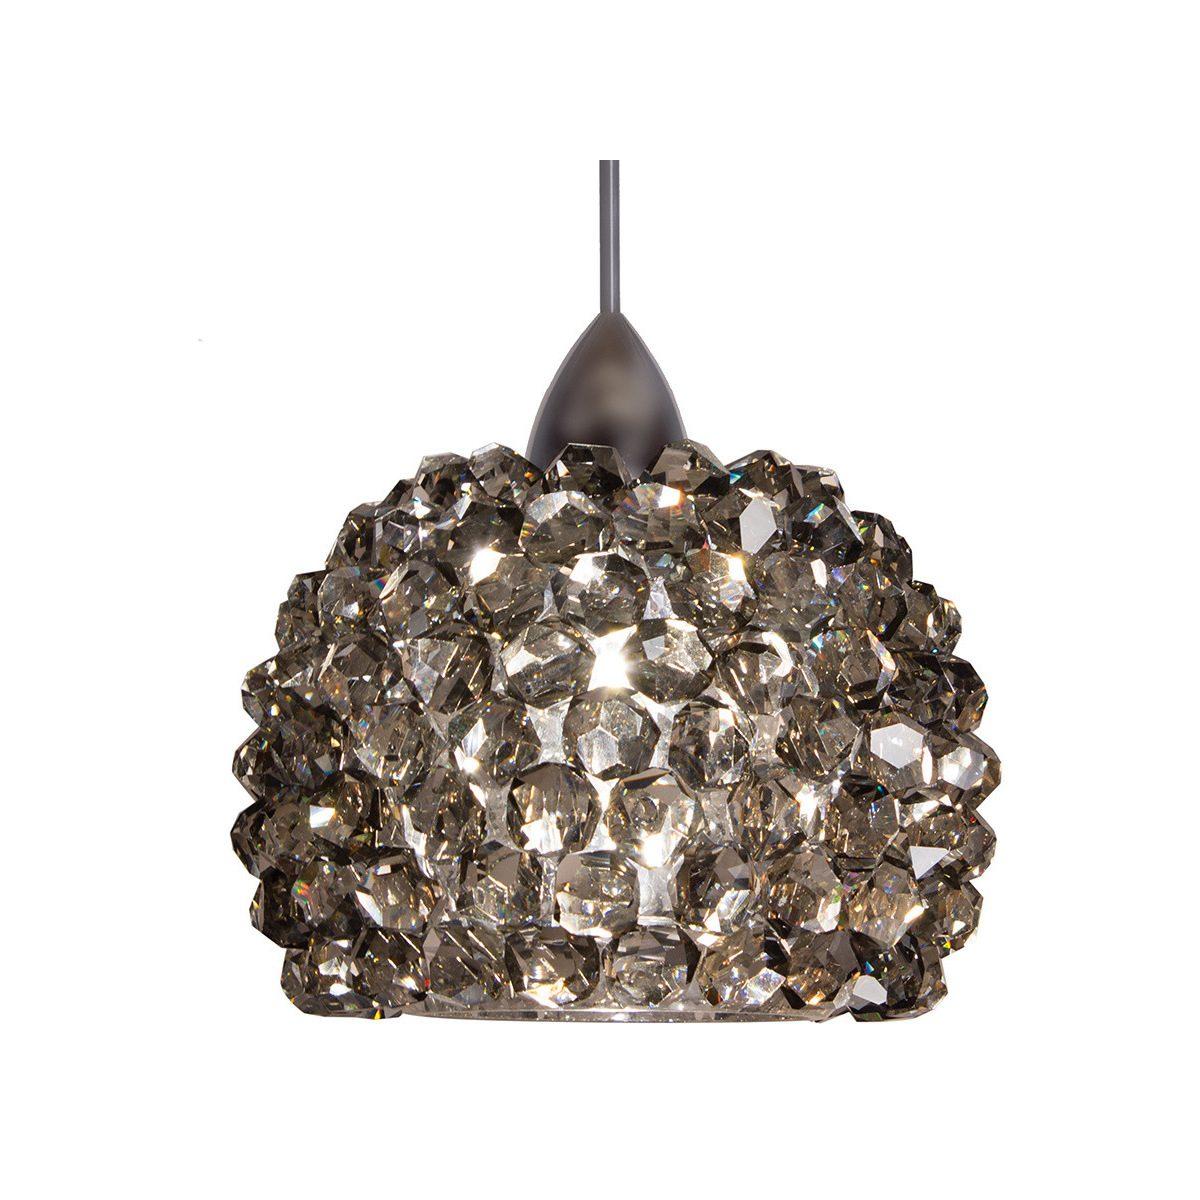 Led Diamond 1Clear CrystalBrushed Colgante Gia Lampara q5AjLc3R4